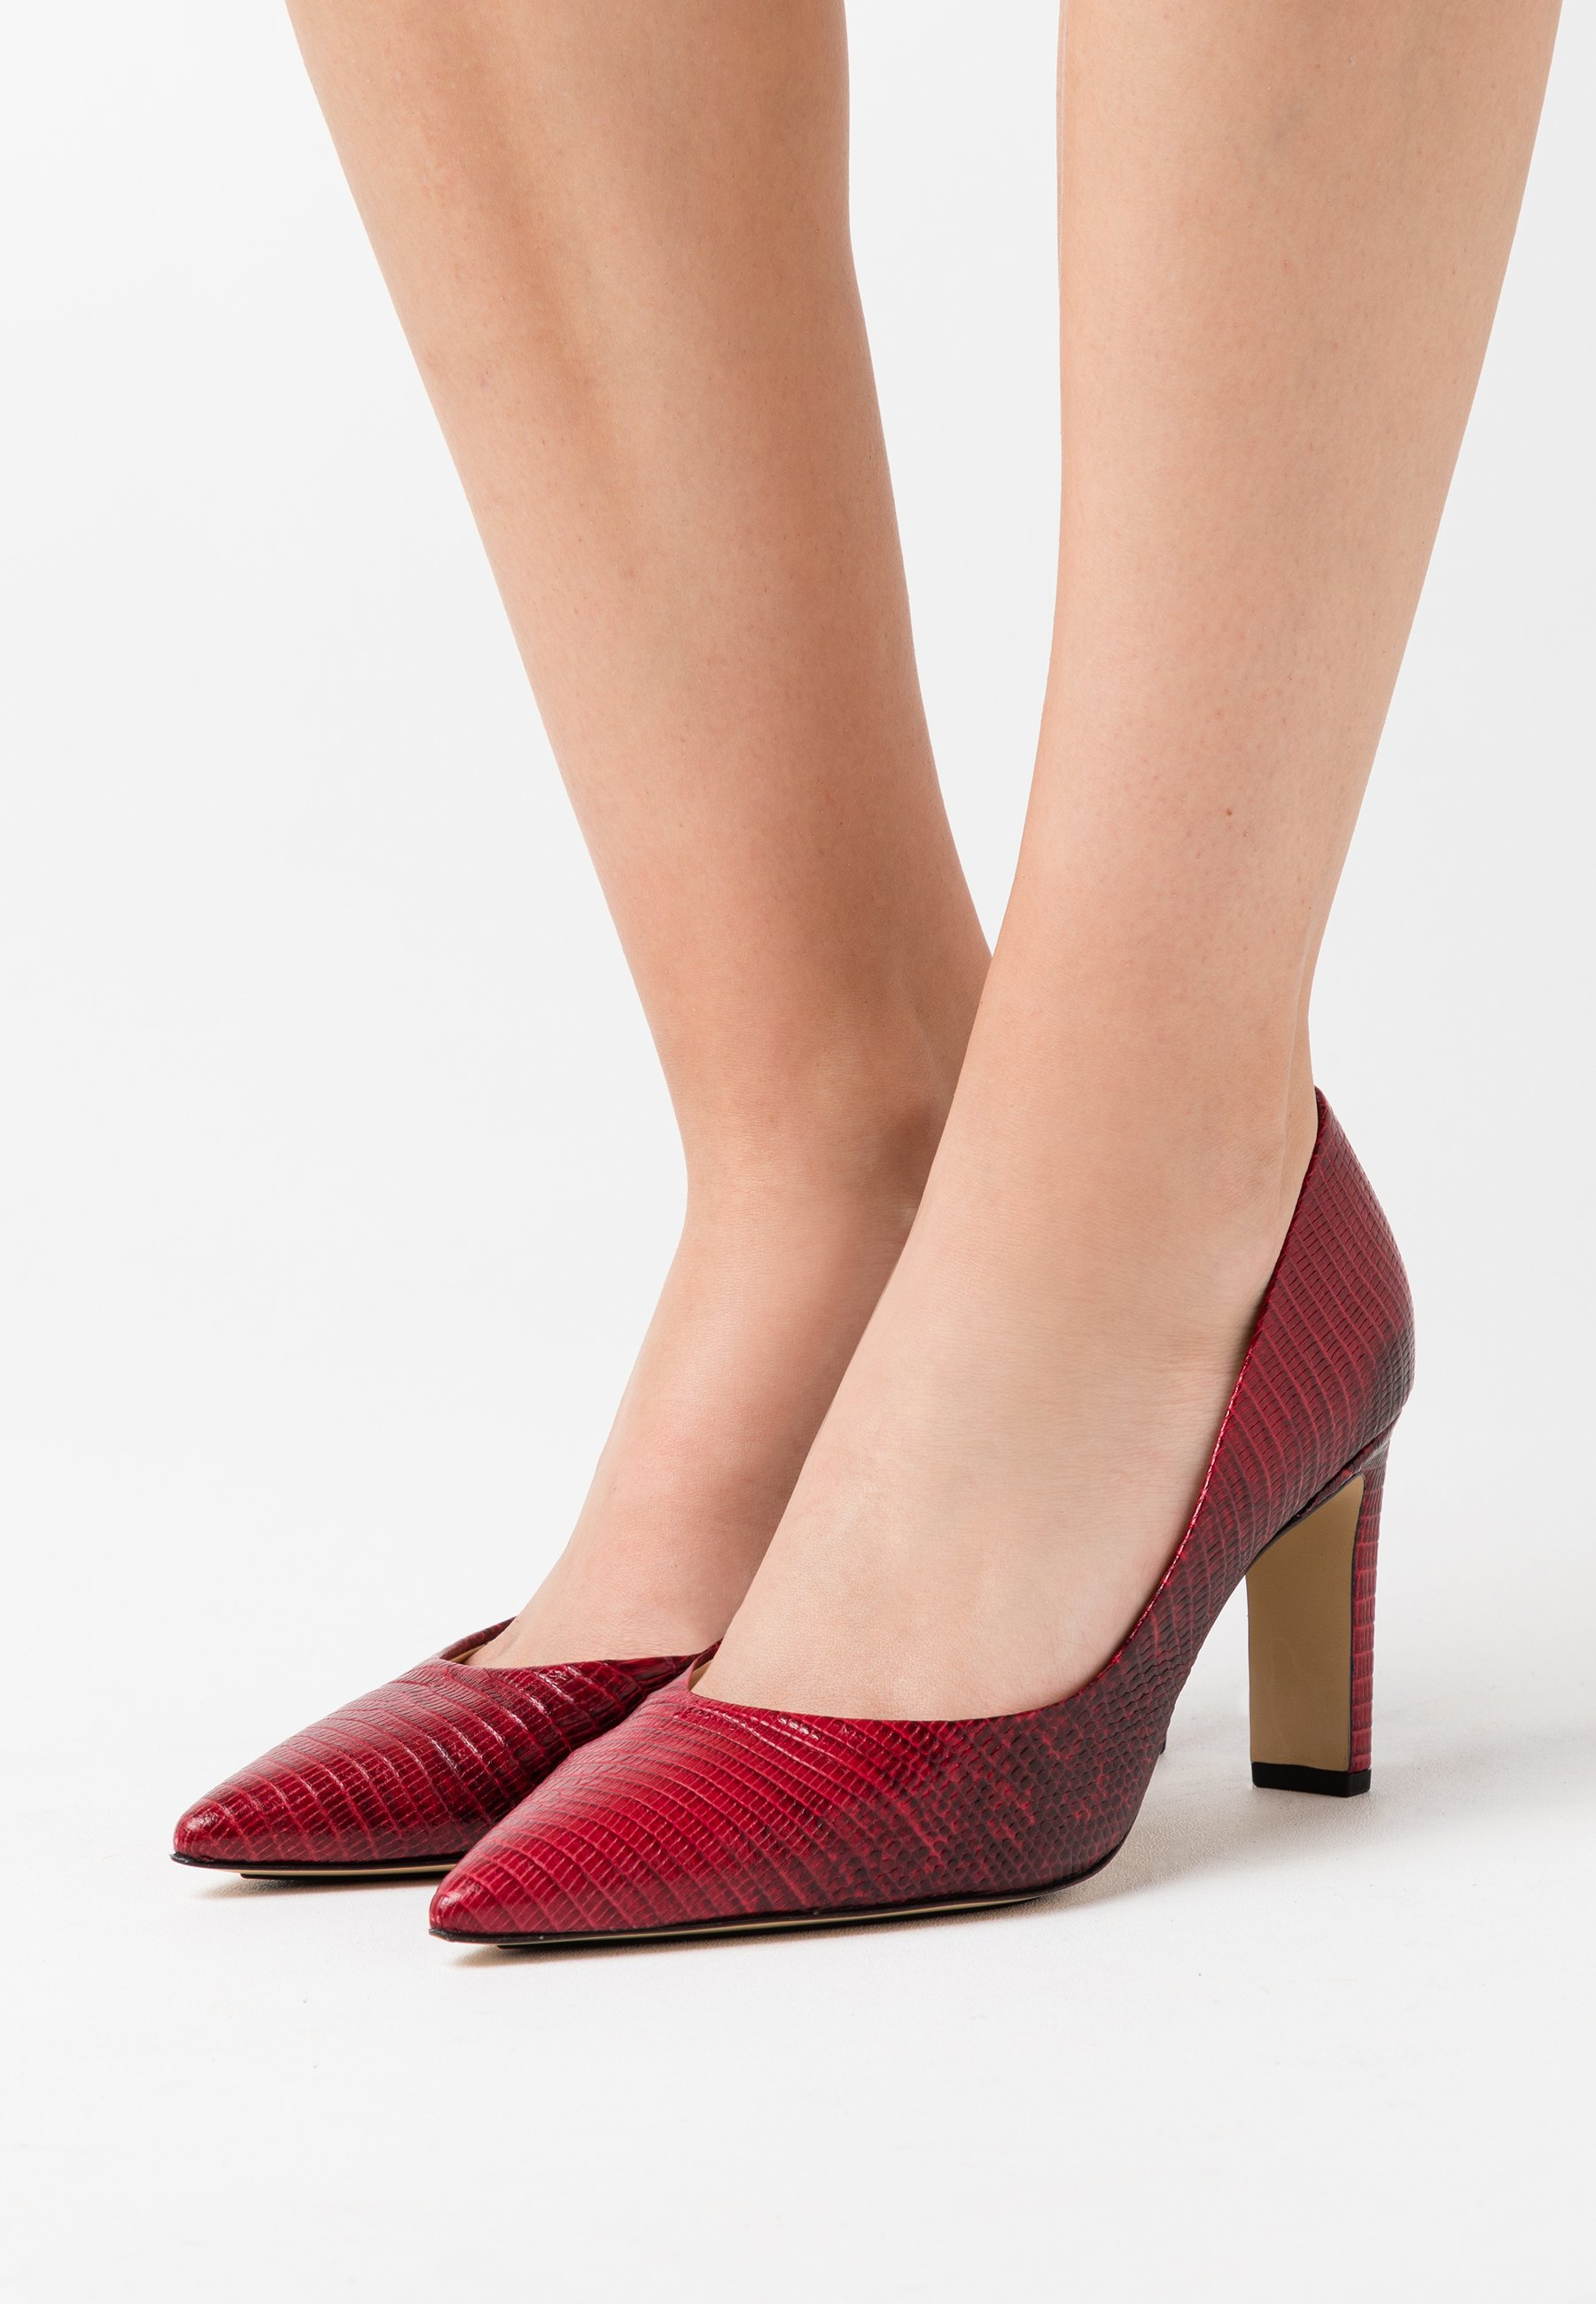 Auténtico Högl Zapatos altos - lizzard cherry | Calzado de mujer2020 pPg0z